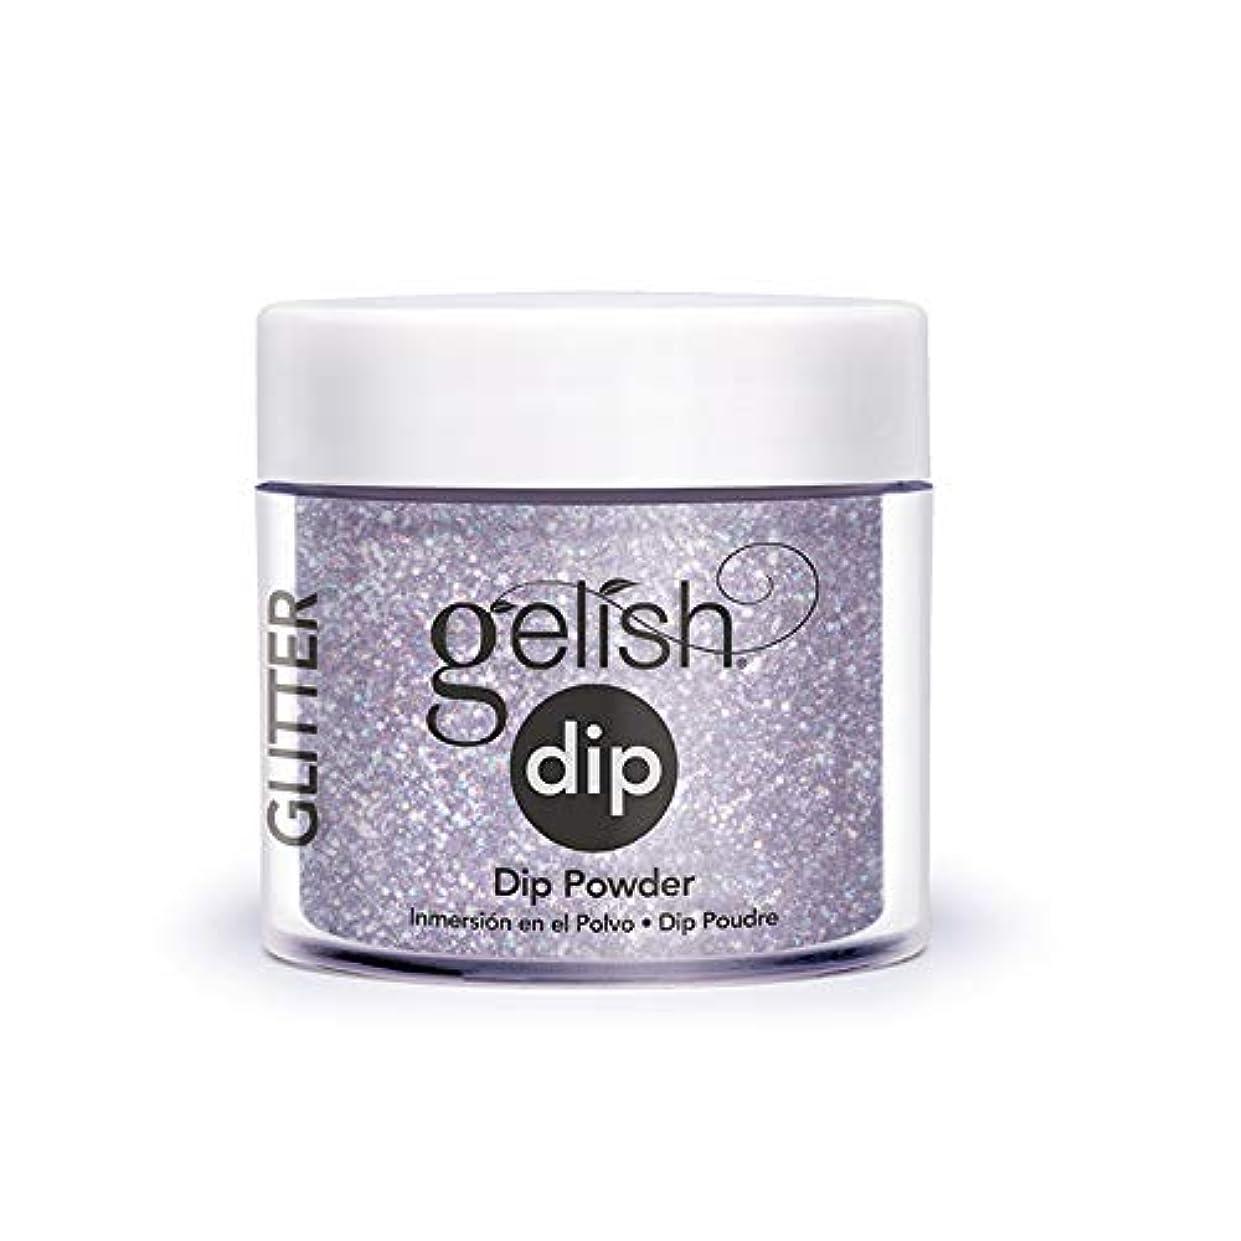 Harmony Gelish - Acrylic Dip Powder - Let Them Eat Cake - 23g / 0.8oz